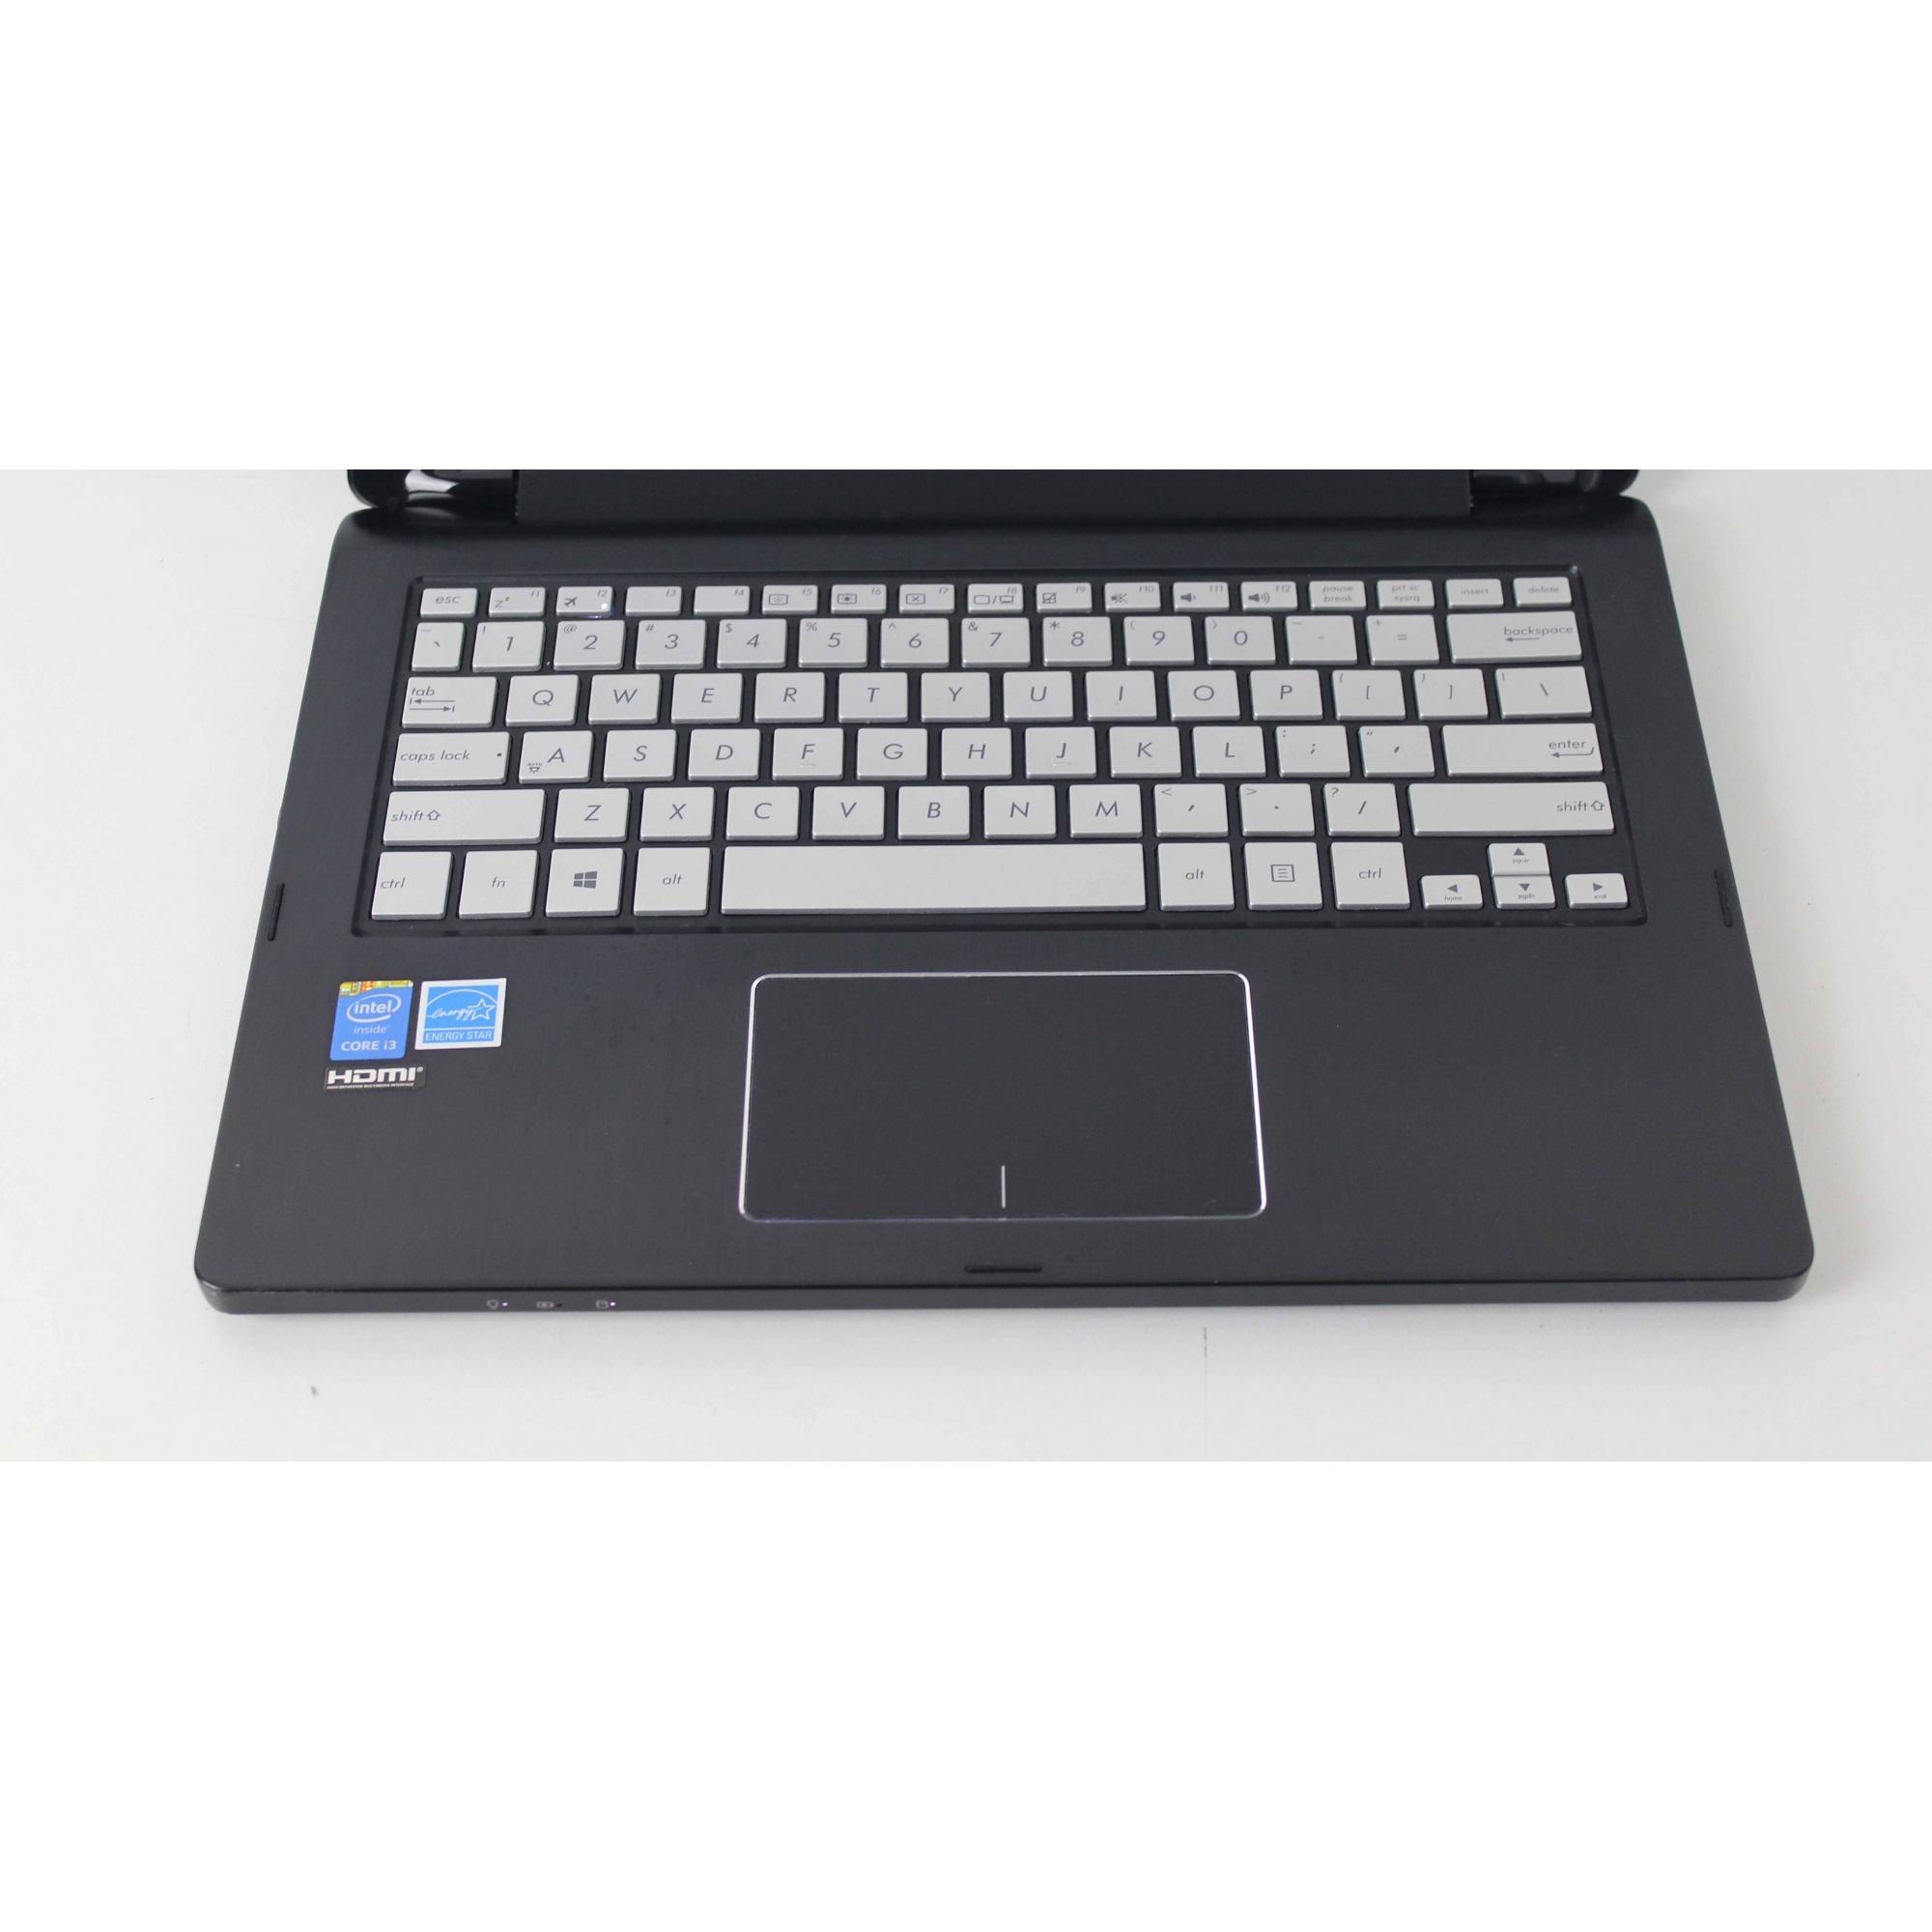 "Notebook 2 em 1 ASUS Q302L 13.3"" Intel Core i3 4GB HD-500GB + Touch"